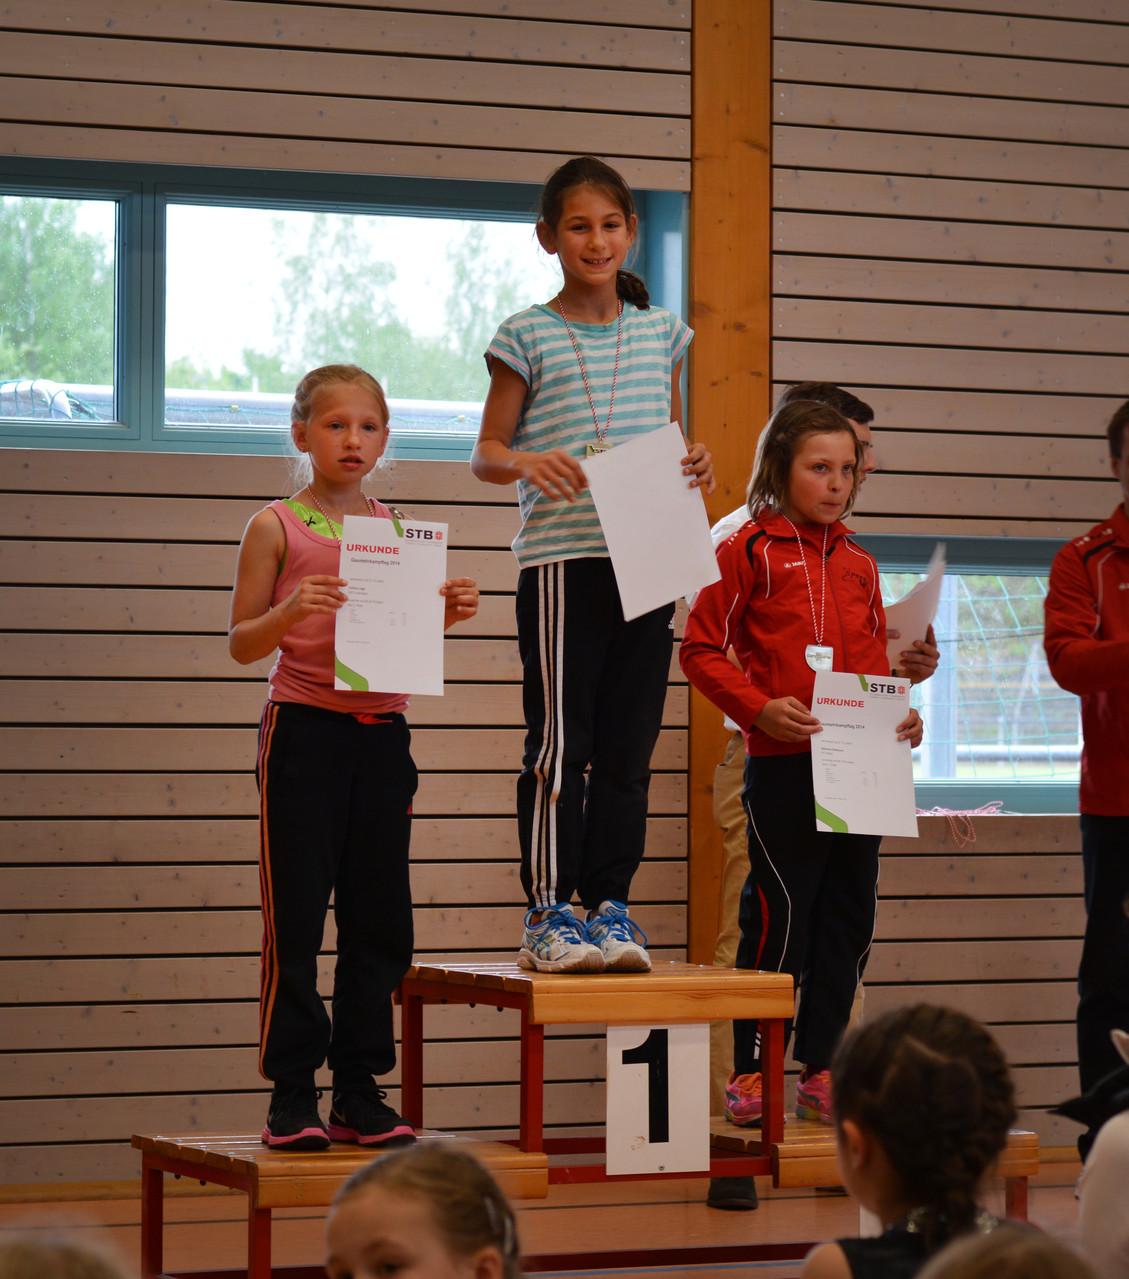 1.Platz Amelie Holzer, 2. Platz Celina Luga